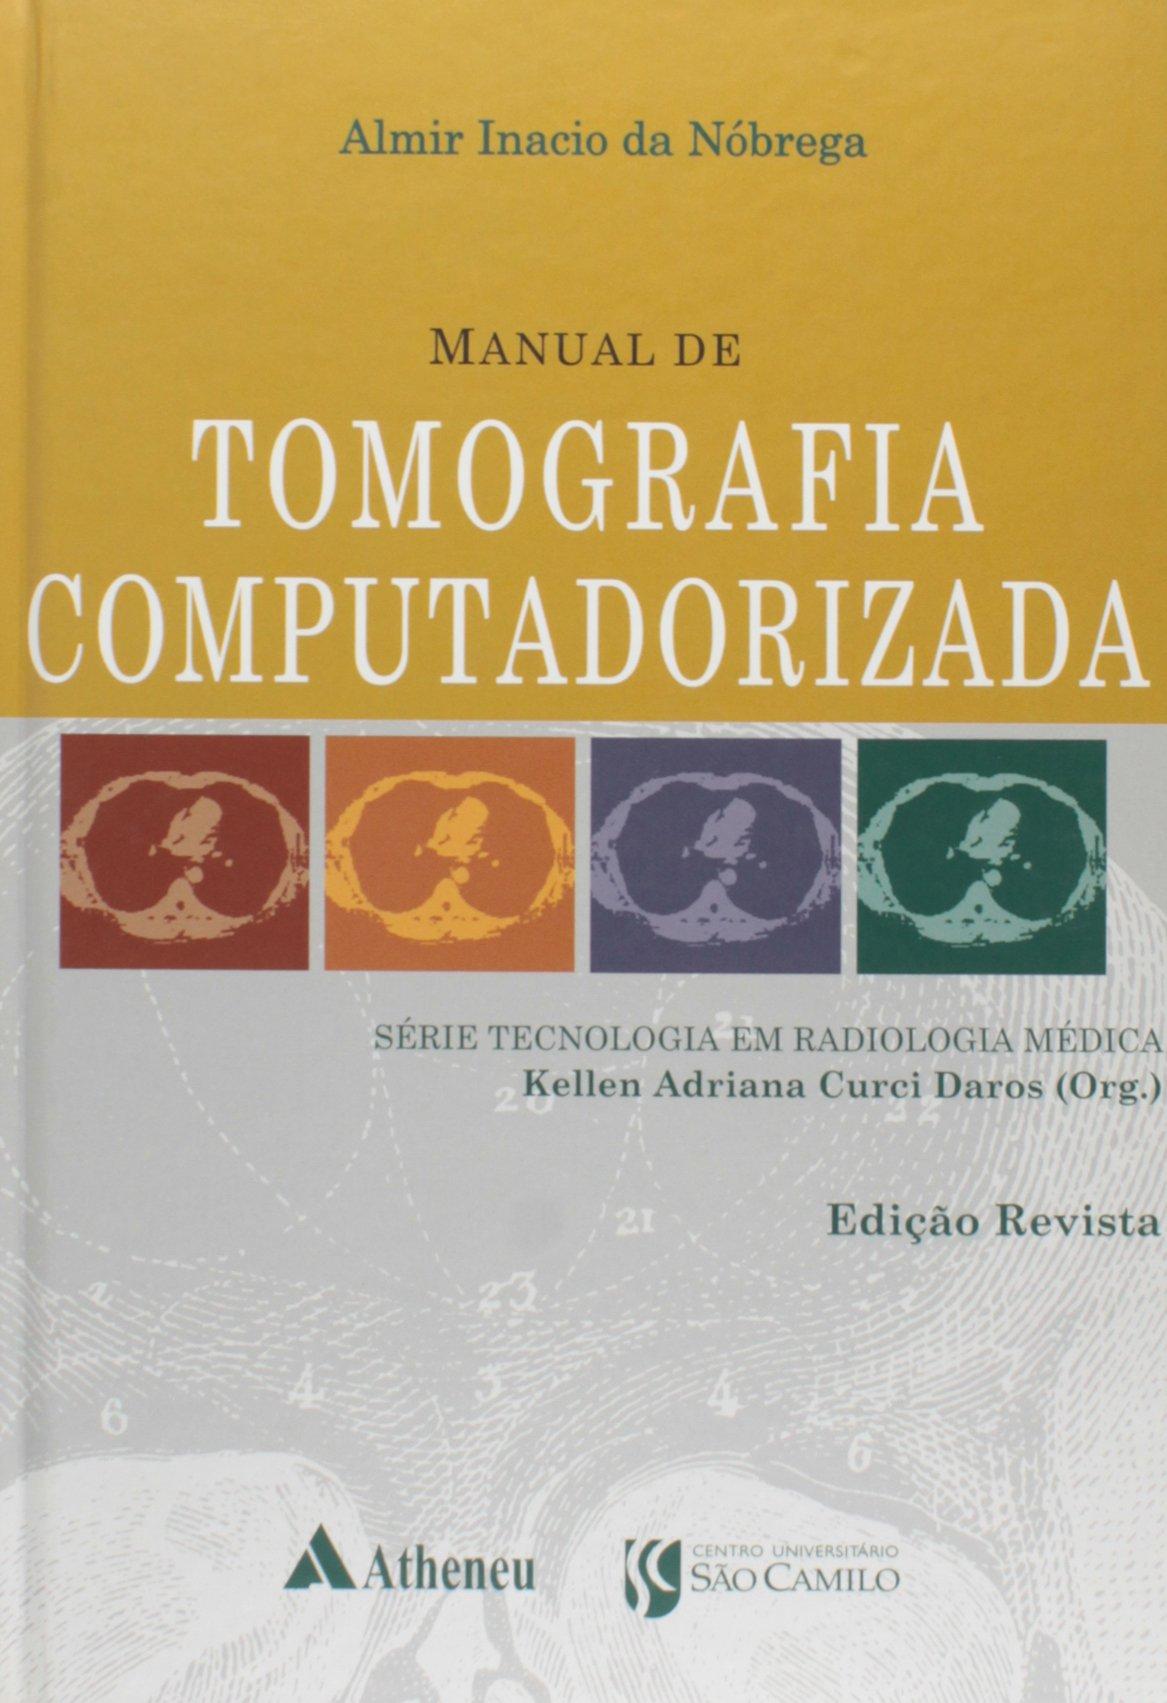 Manual de Tomografia Computadorizada Em Portuguese do Brasil: Amazon.es: Almir Inacio da Nóbrega: Libros